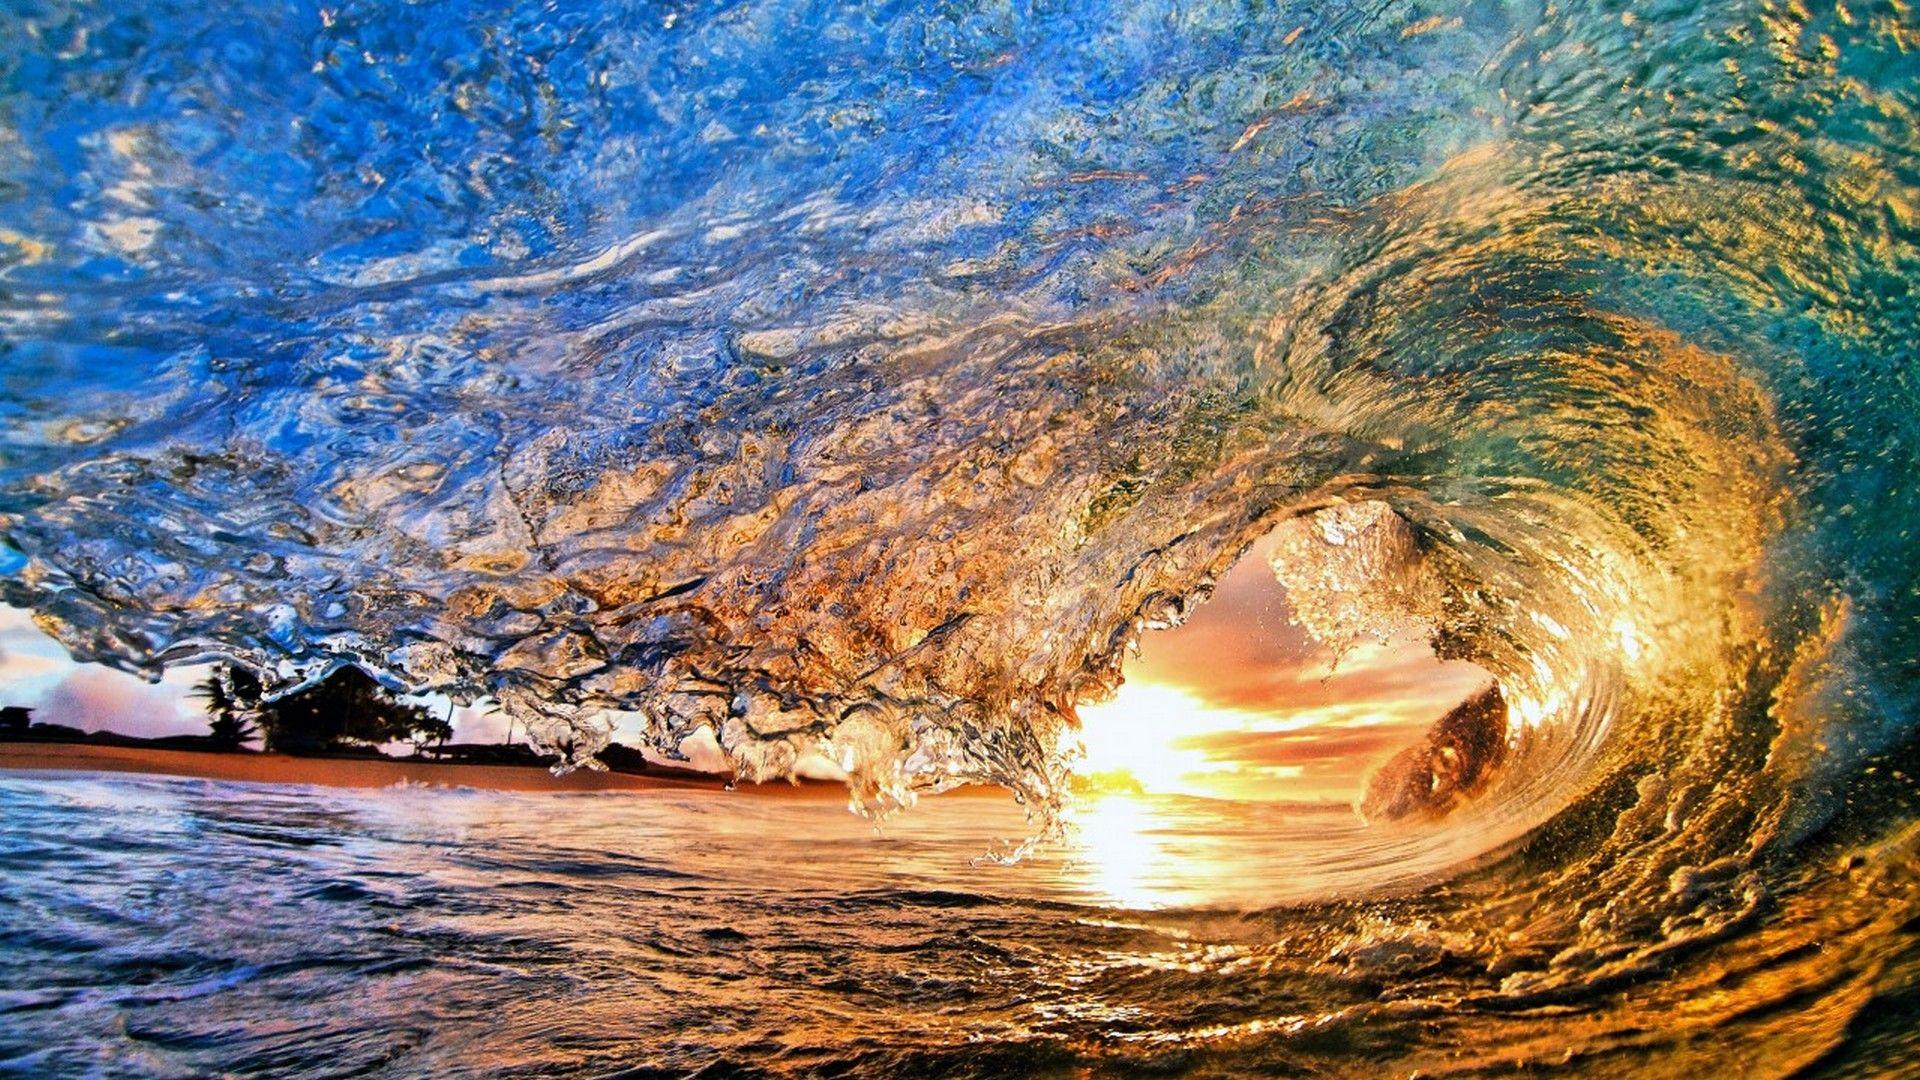 Sunset Time Desktop Backgrounds in 2020 Waves wallpaper